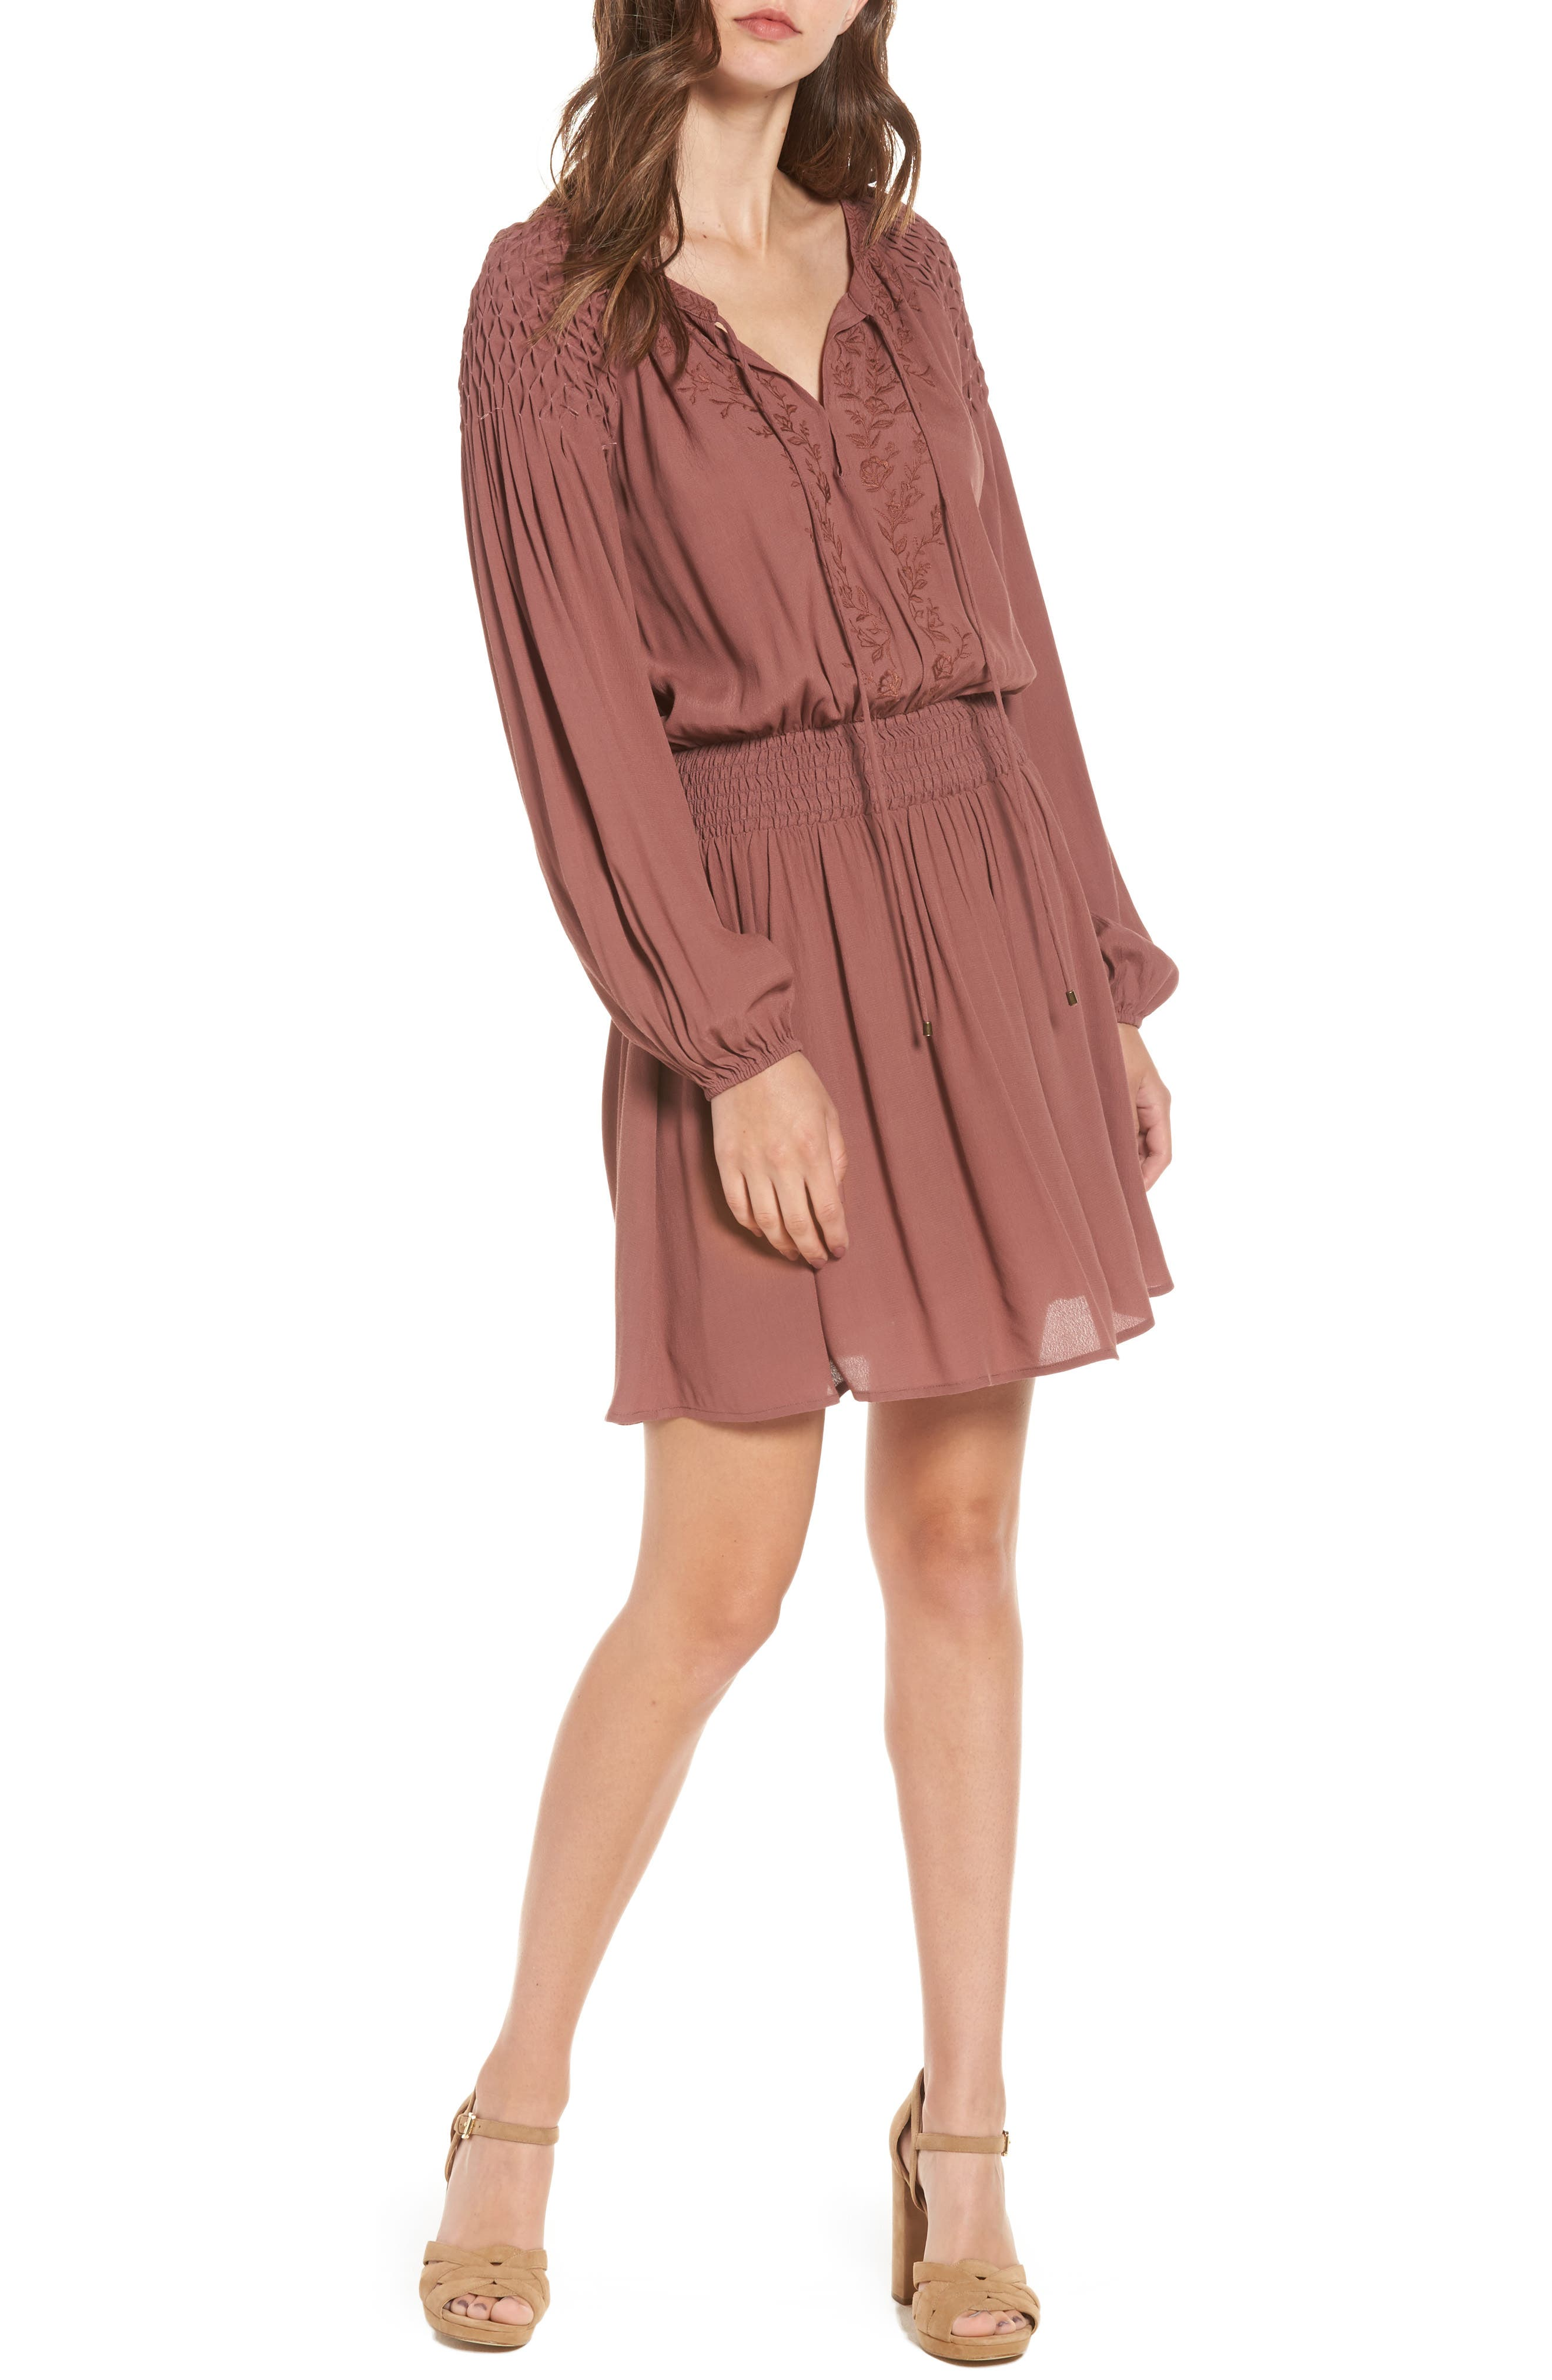 Alternate Image 1 Selected - ASTR the Label Melinda Blouson Dress